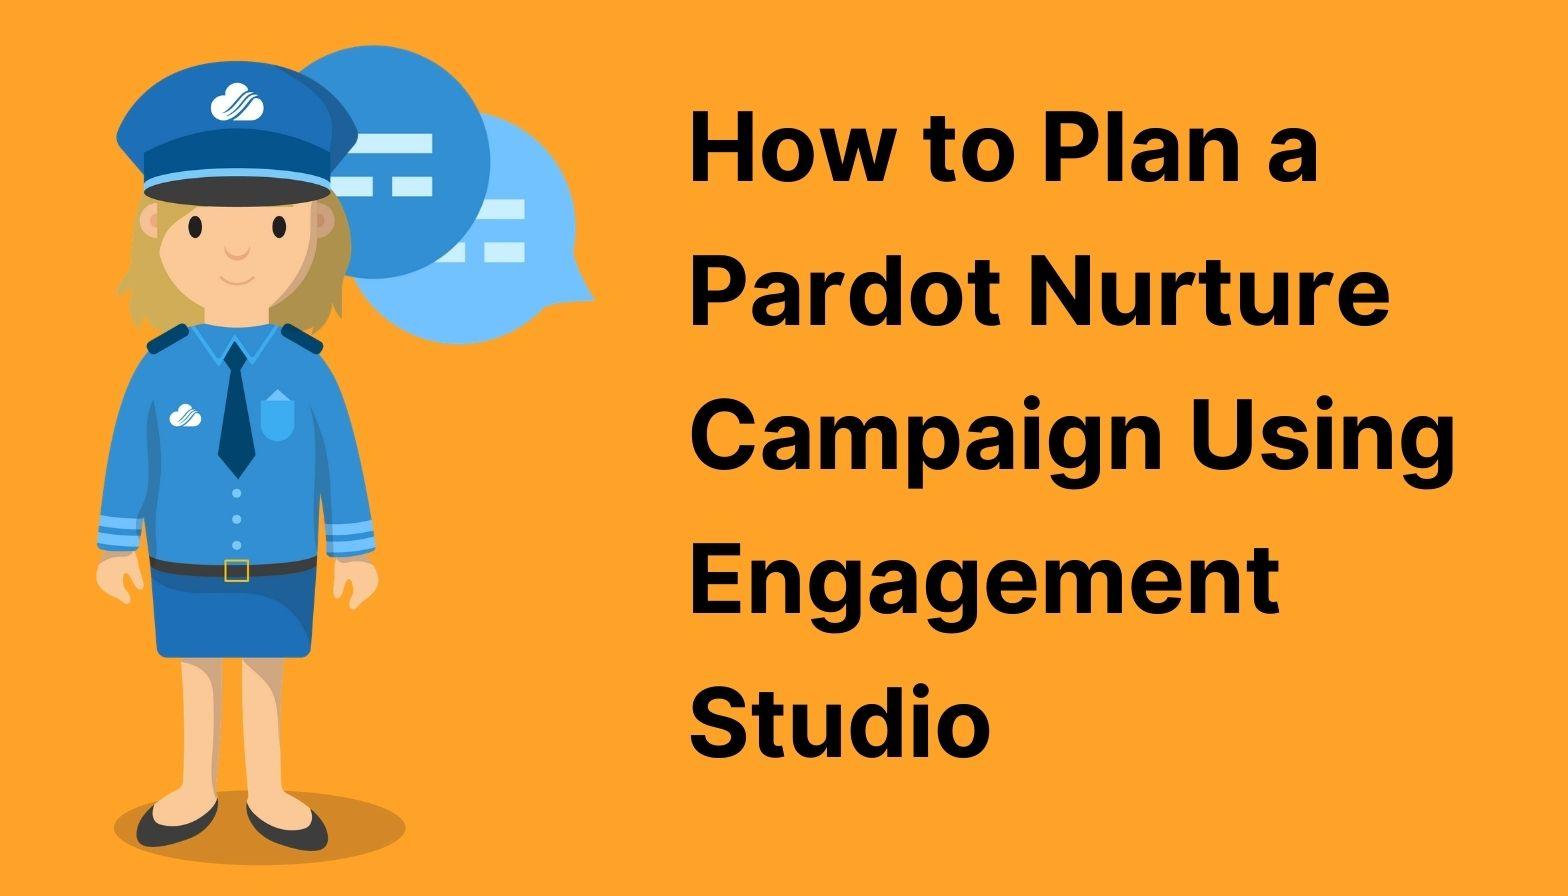 Blog Feature Image - how to plan a pardot nurture campaign using engagement studio